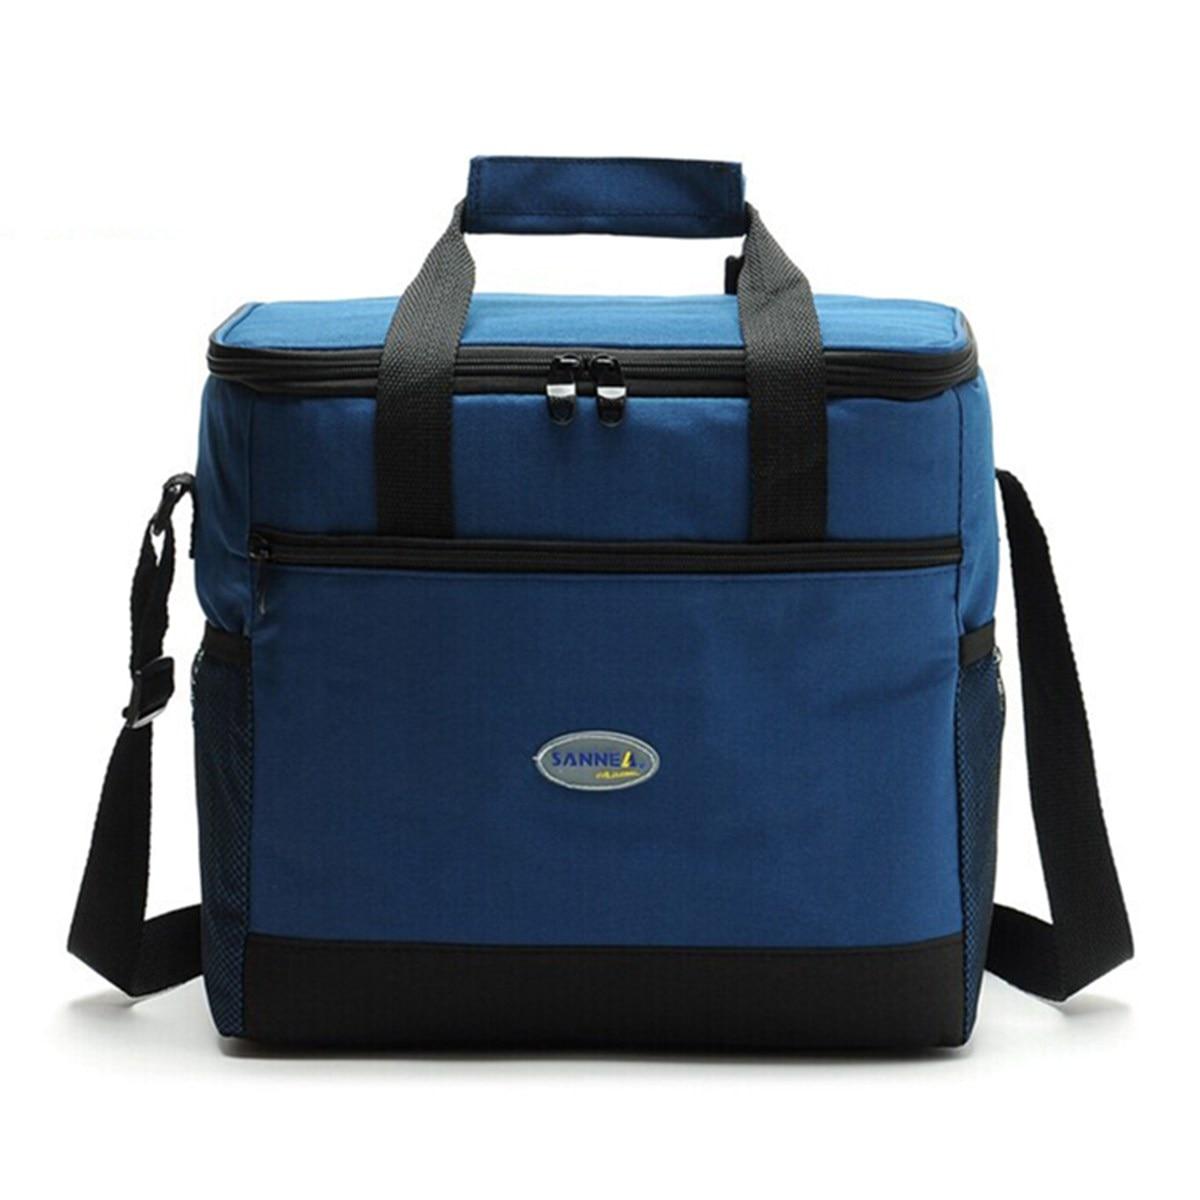 Waterproof Insulated Cooler Bag Baby Diaper Mlik Bottles Food Supplement Insulation Bag Outdoor Camping Picnic Shoulder Hand Bag